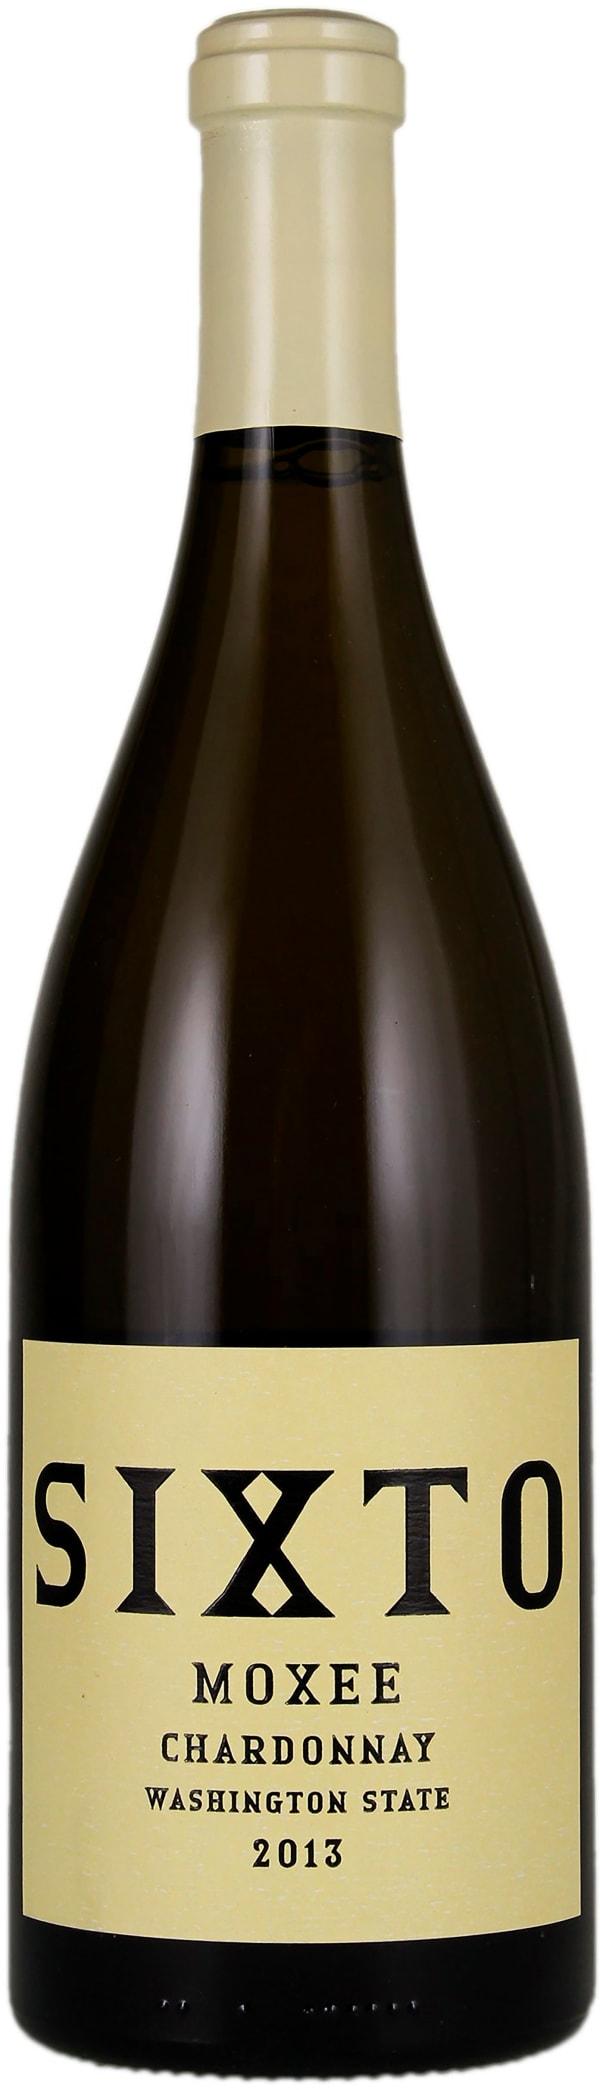 SIXTO Moxee Chardonnay 2013